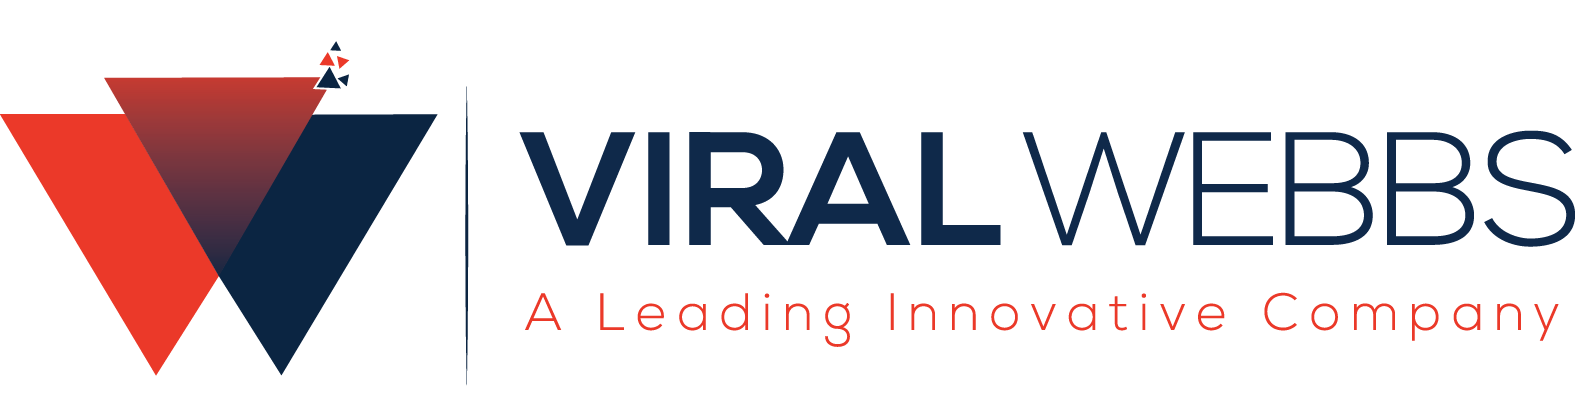 Viral Webbs | Web Design, Development, Graphic Design & more